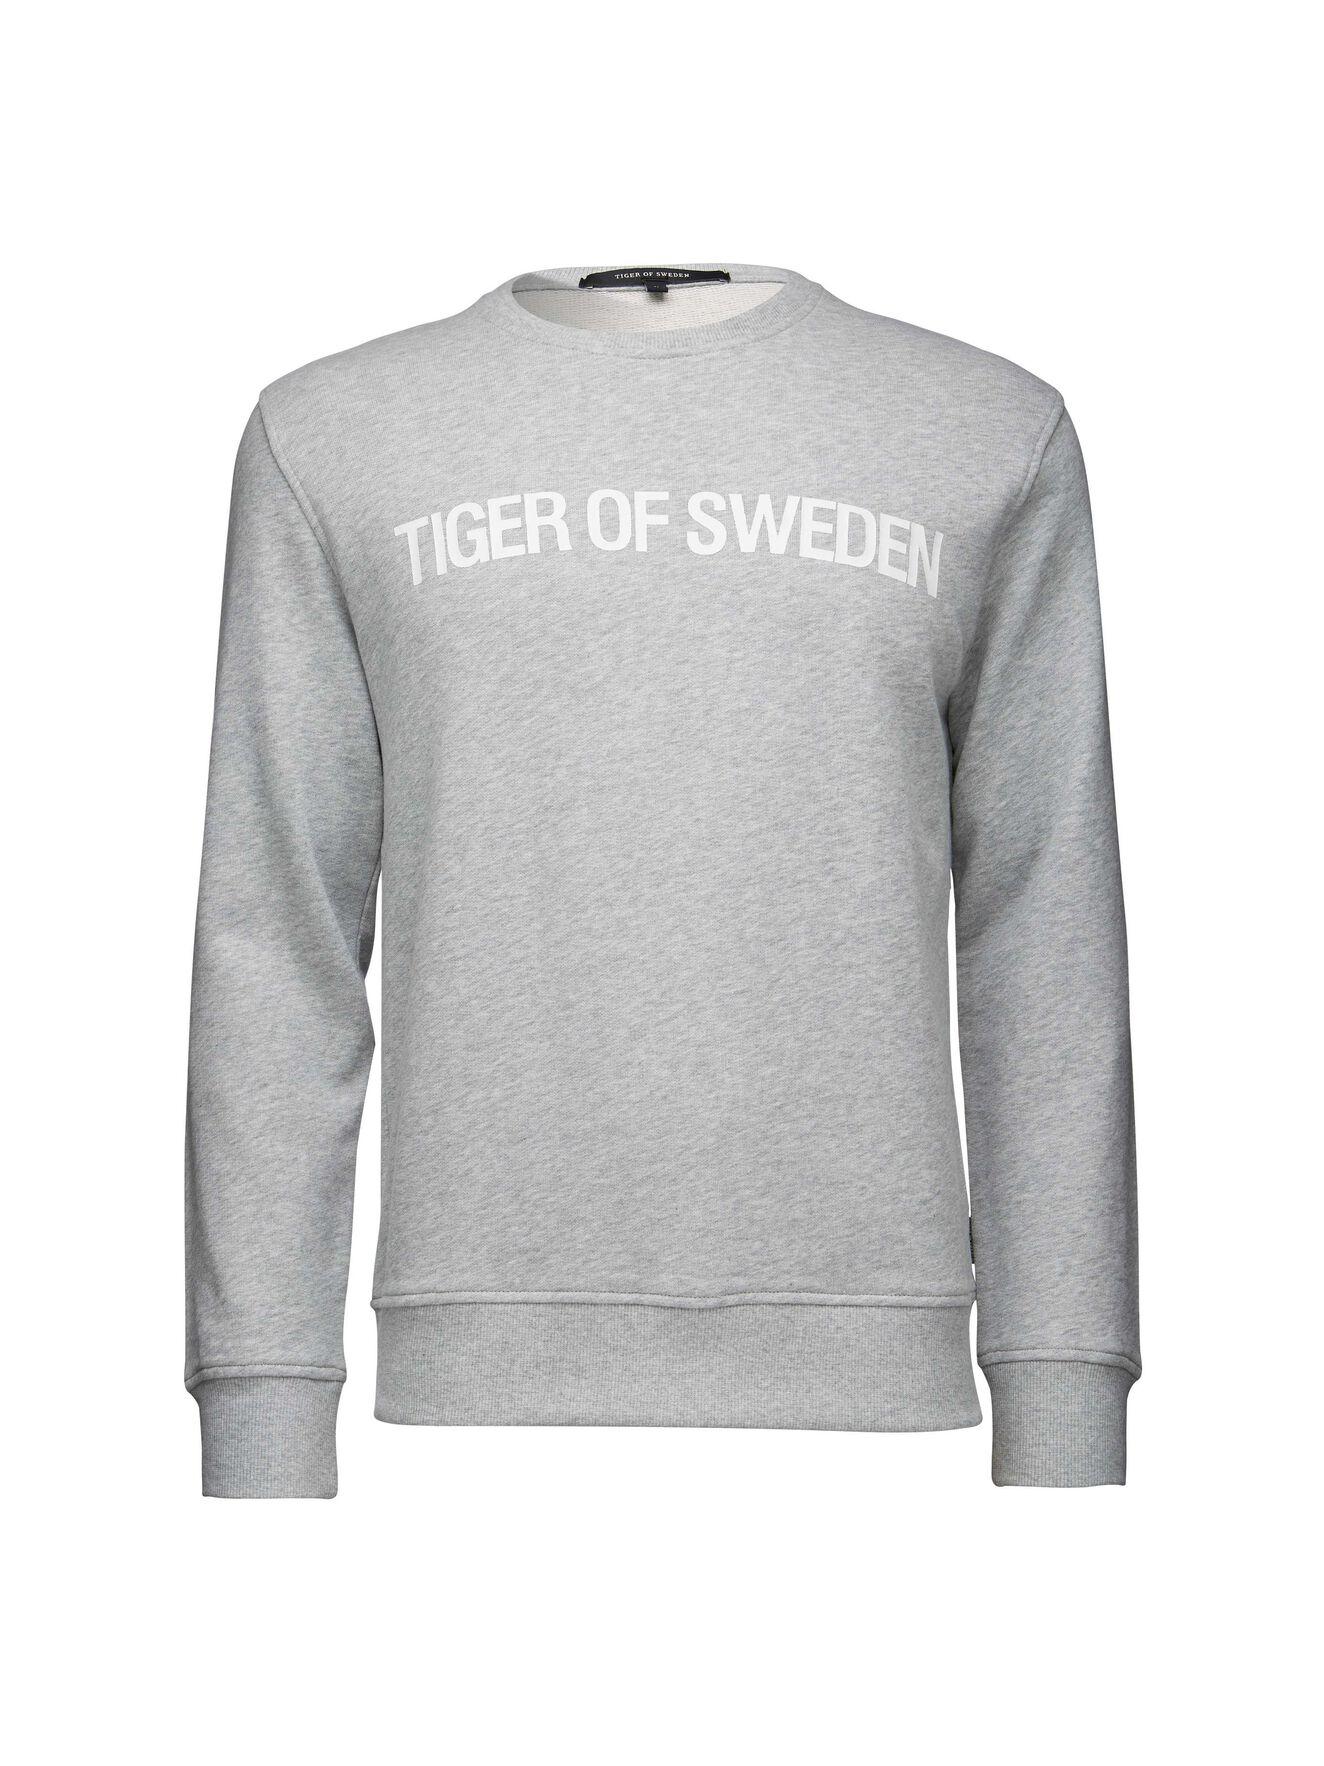 strattford sweatshirt in Plutonium from Tiger of Sweden